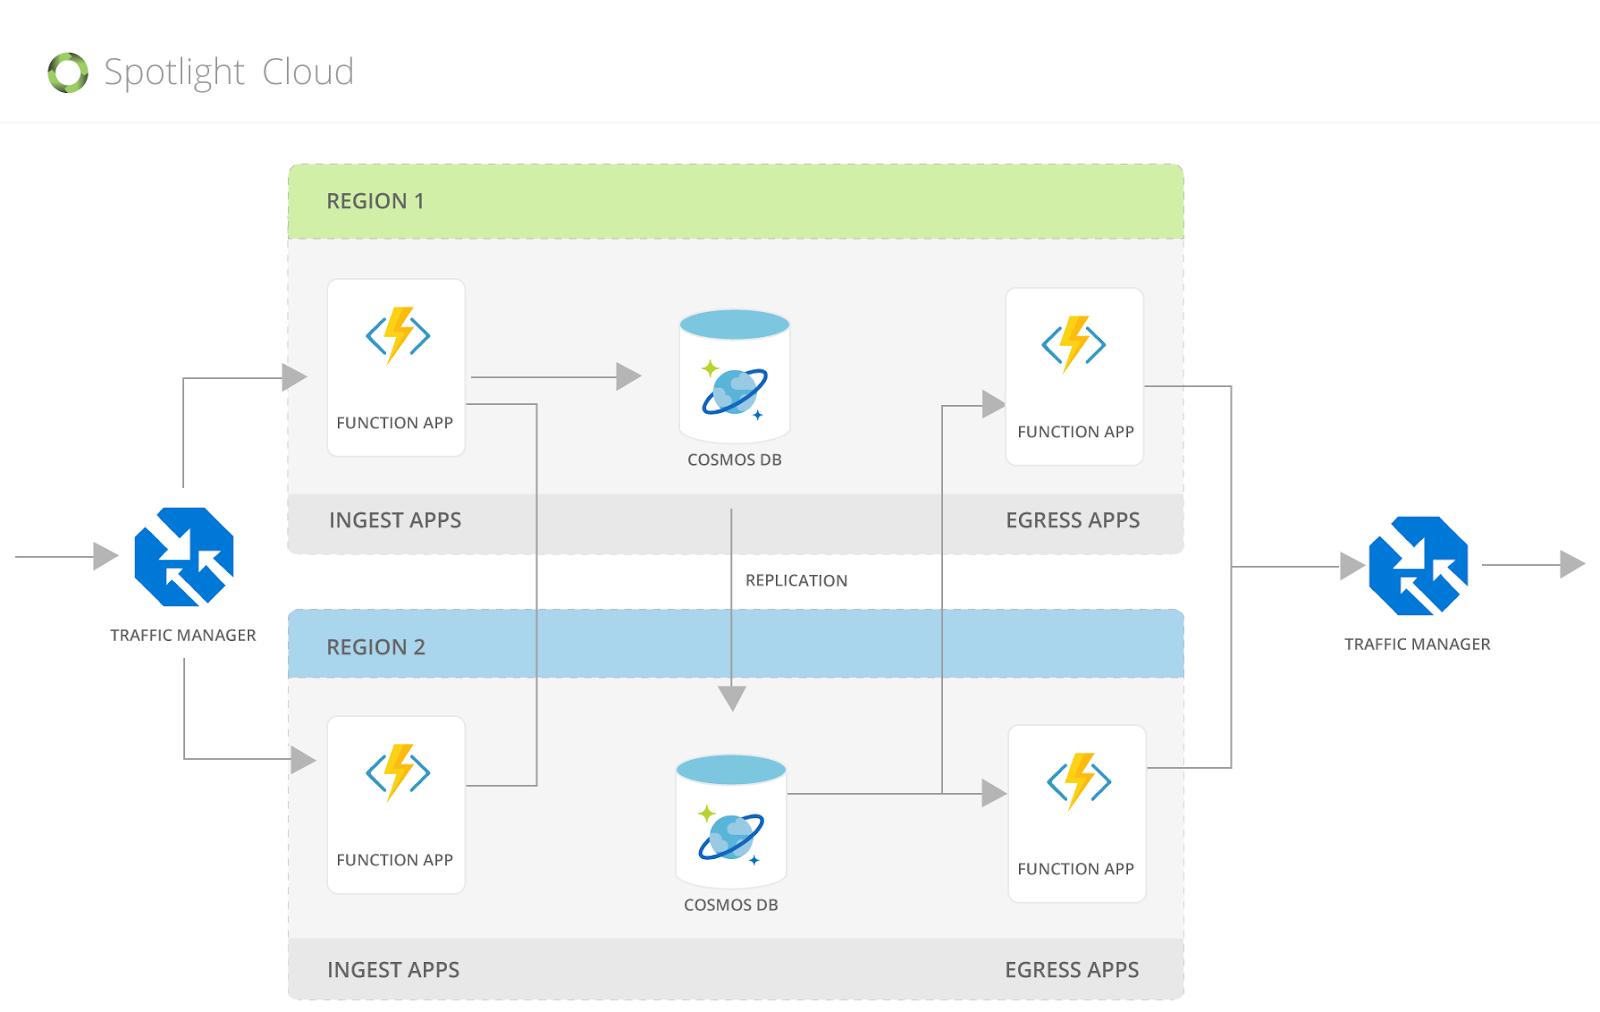 Deployment Diagram of Spotlight Cloud's Ingest and Egress app